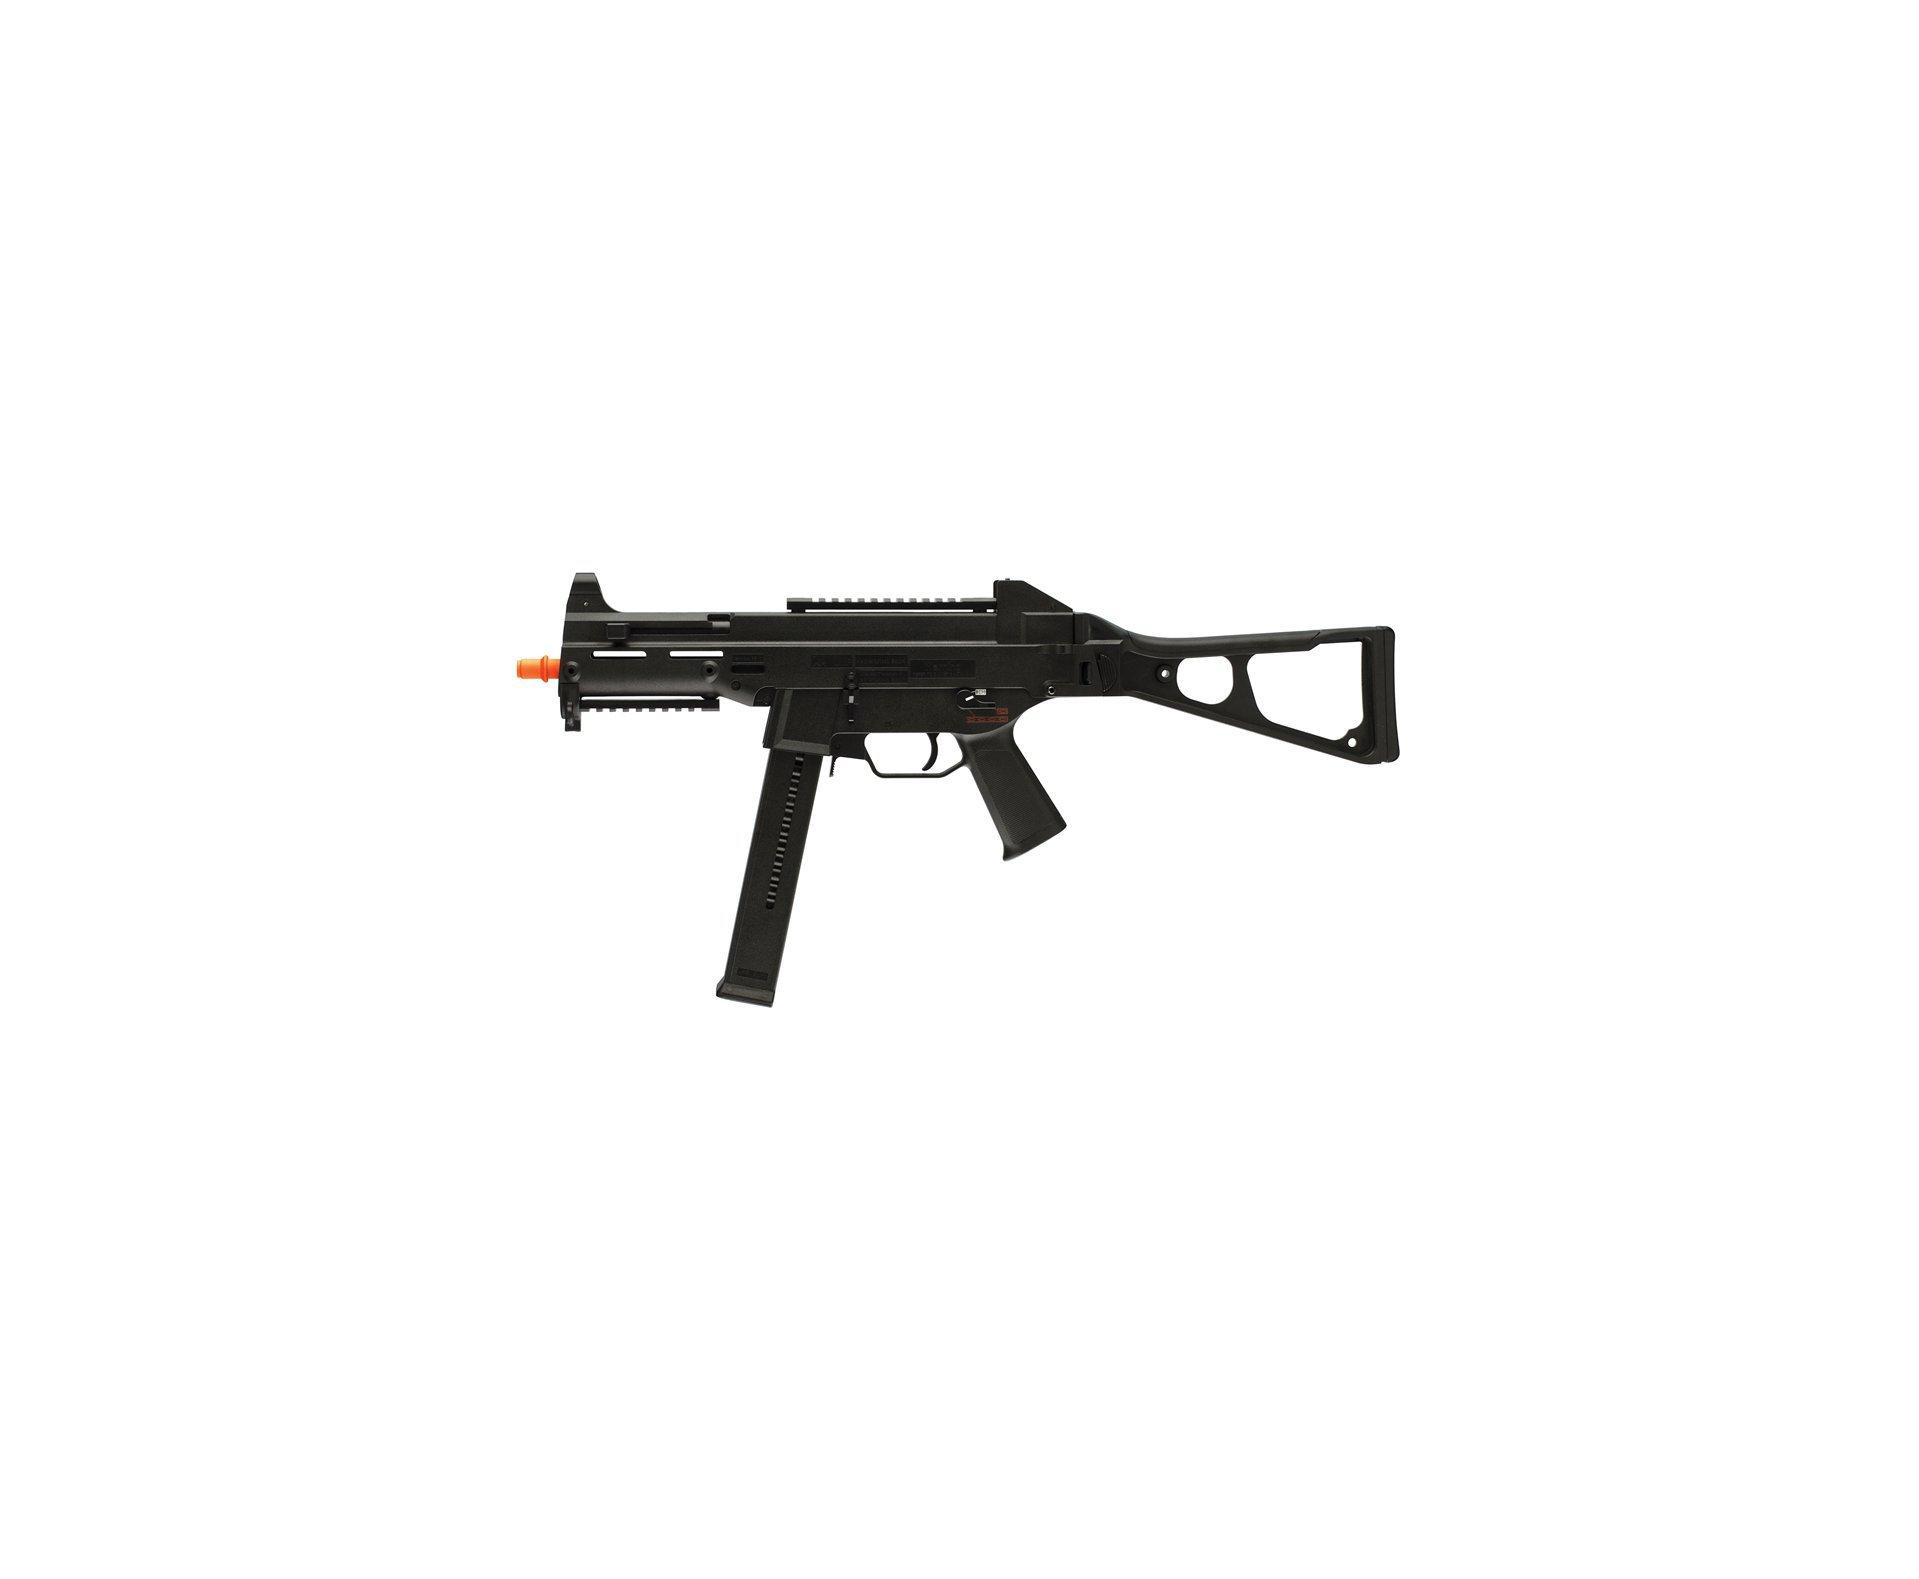 Rifle De Airsoft H&k Ump Aeg - Cal 6.0mm + Capa Huntig + 4000 Bbs 0,20g - Umarex